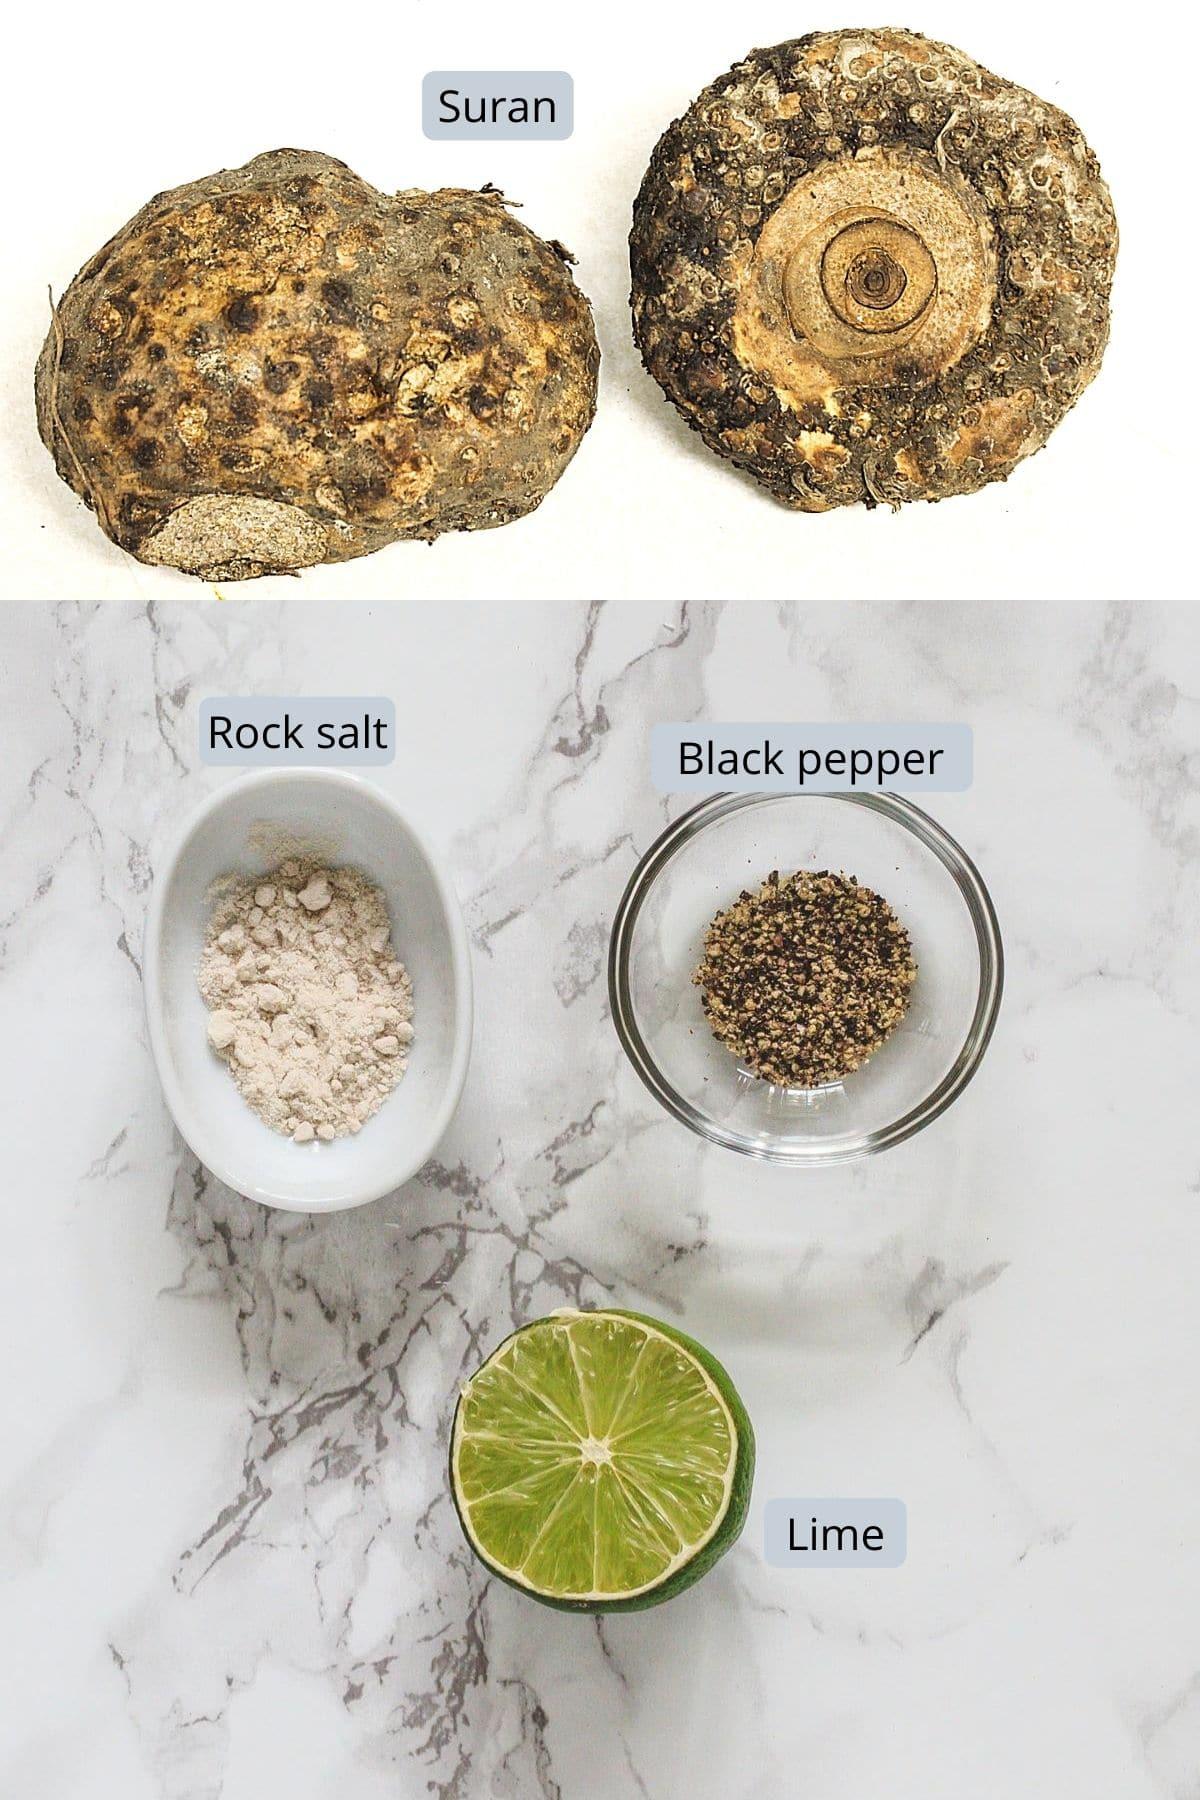 ingredients used in suran chips includes suran, salt, pepper, lime juice